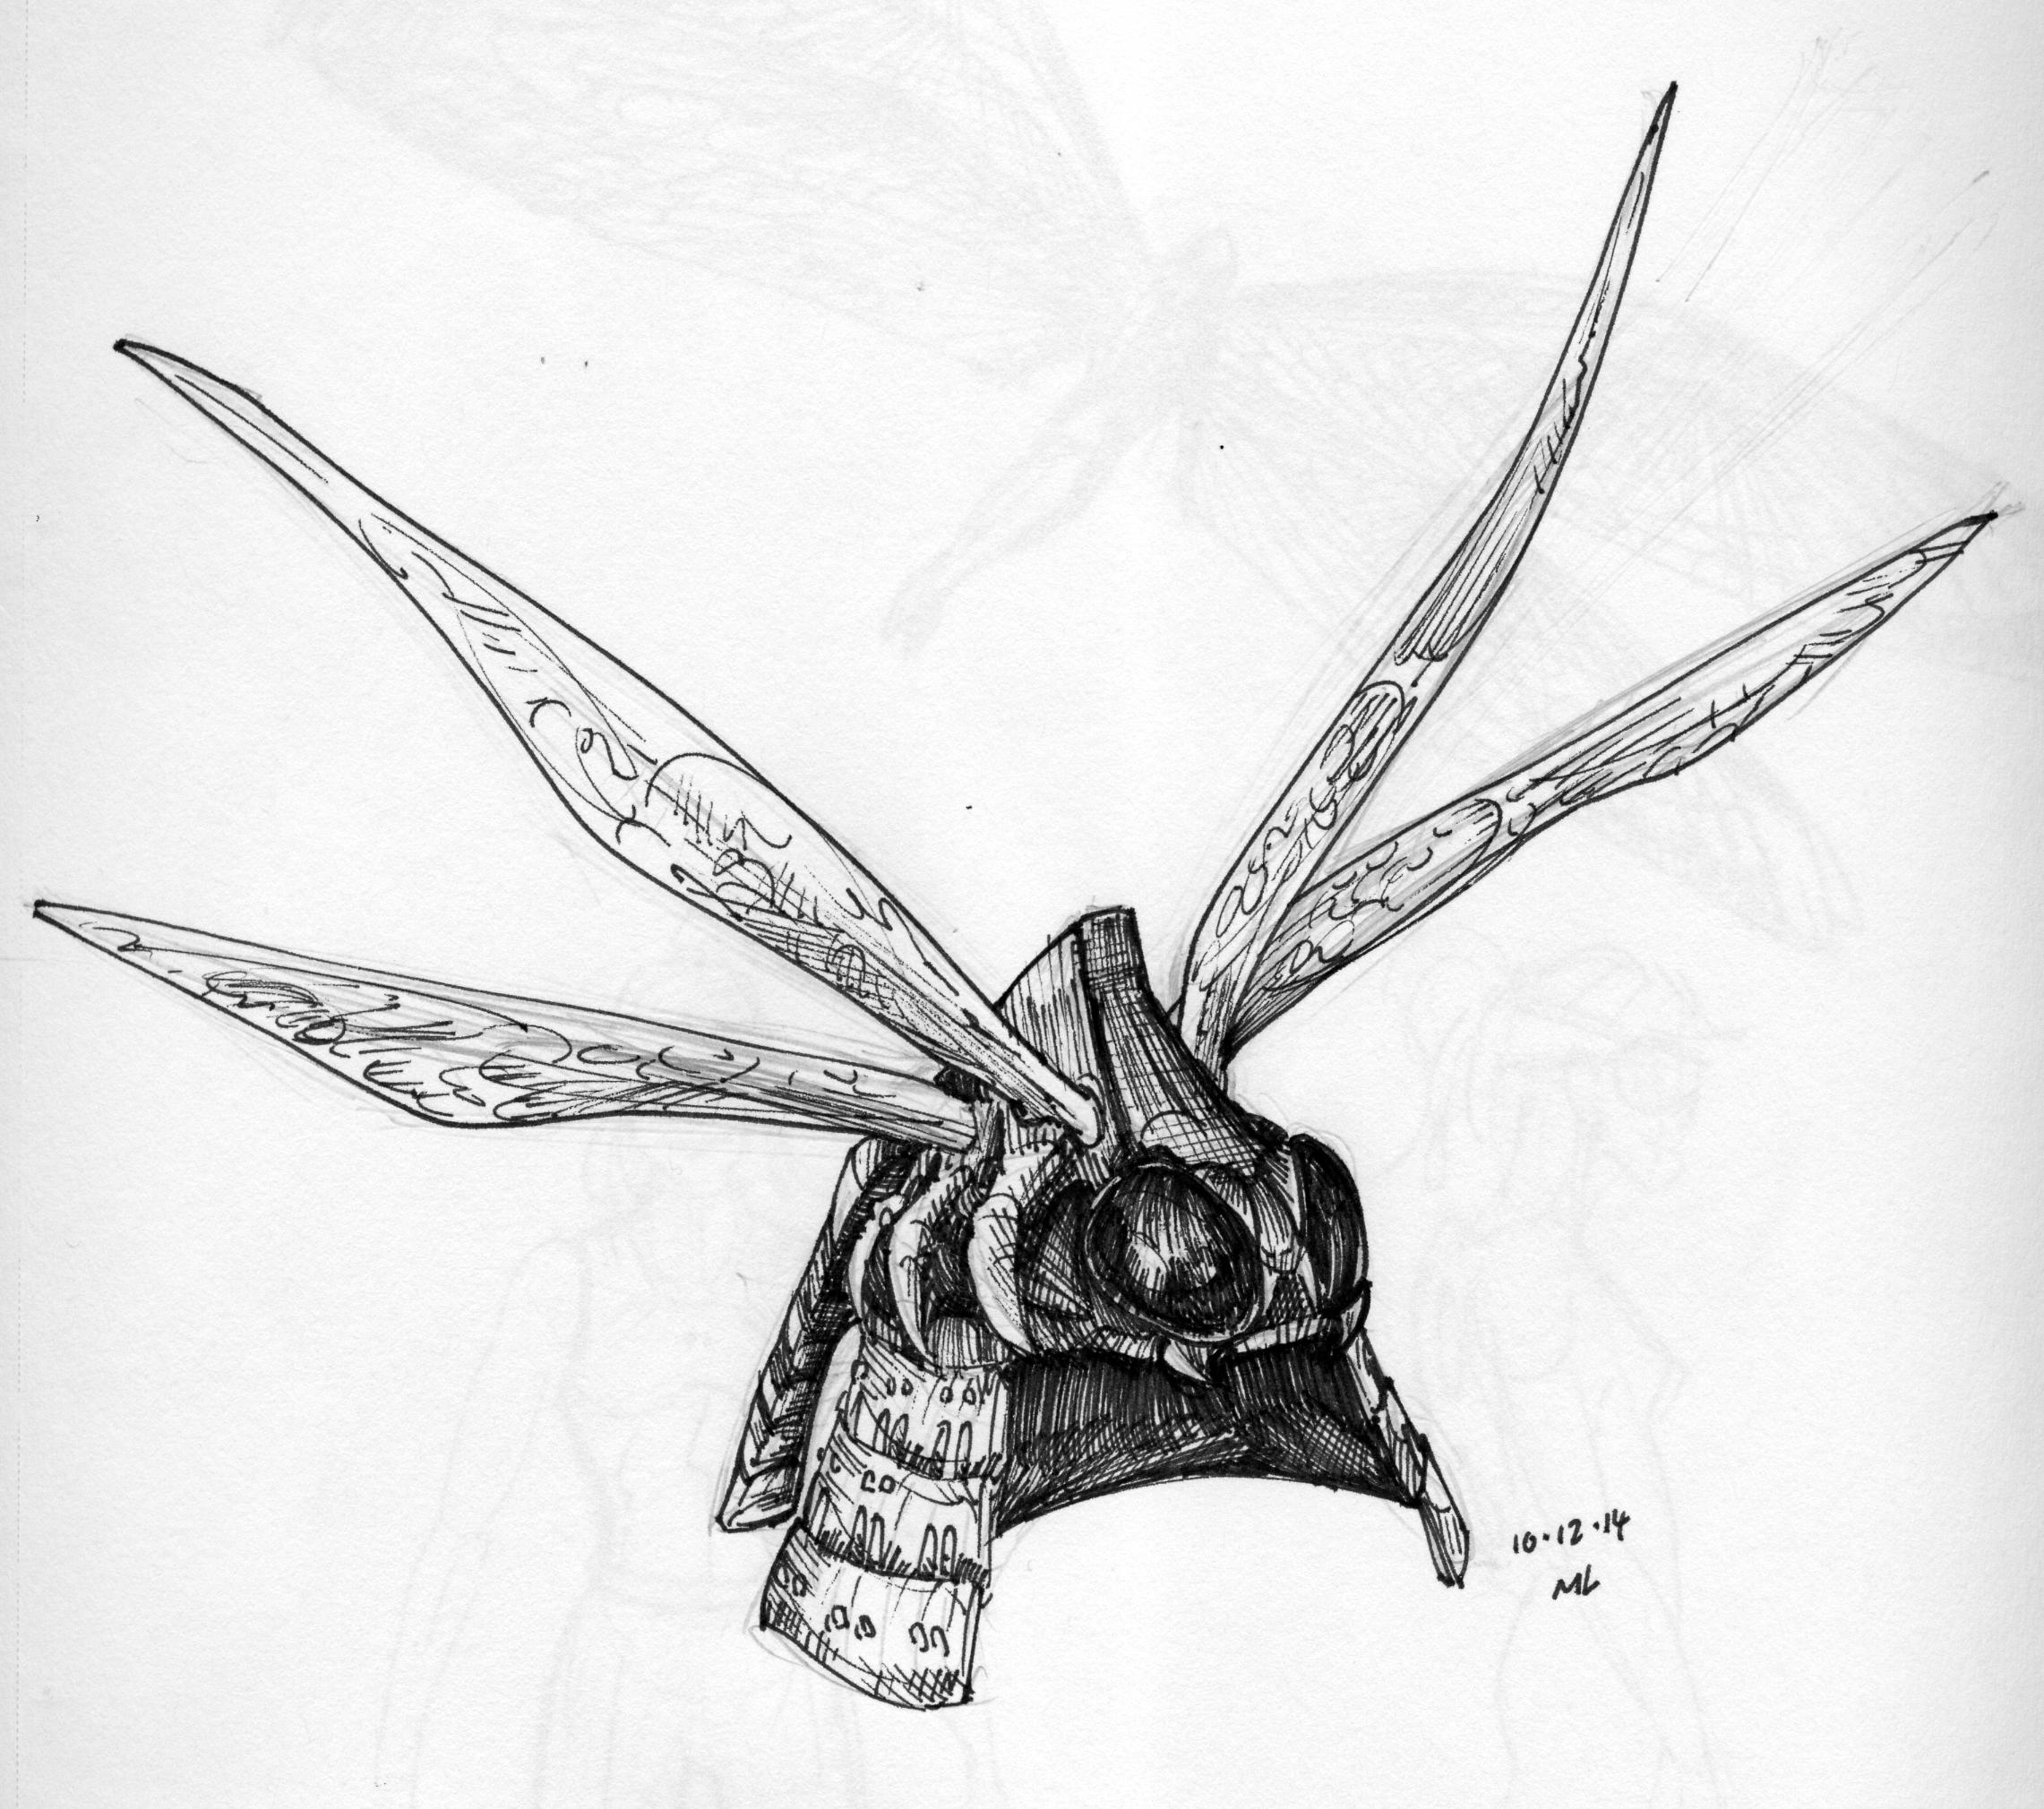 Drawn samurai dragonfly Series kabuto samurai mrleemrlee dragonfly